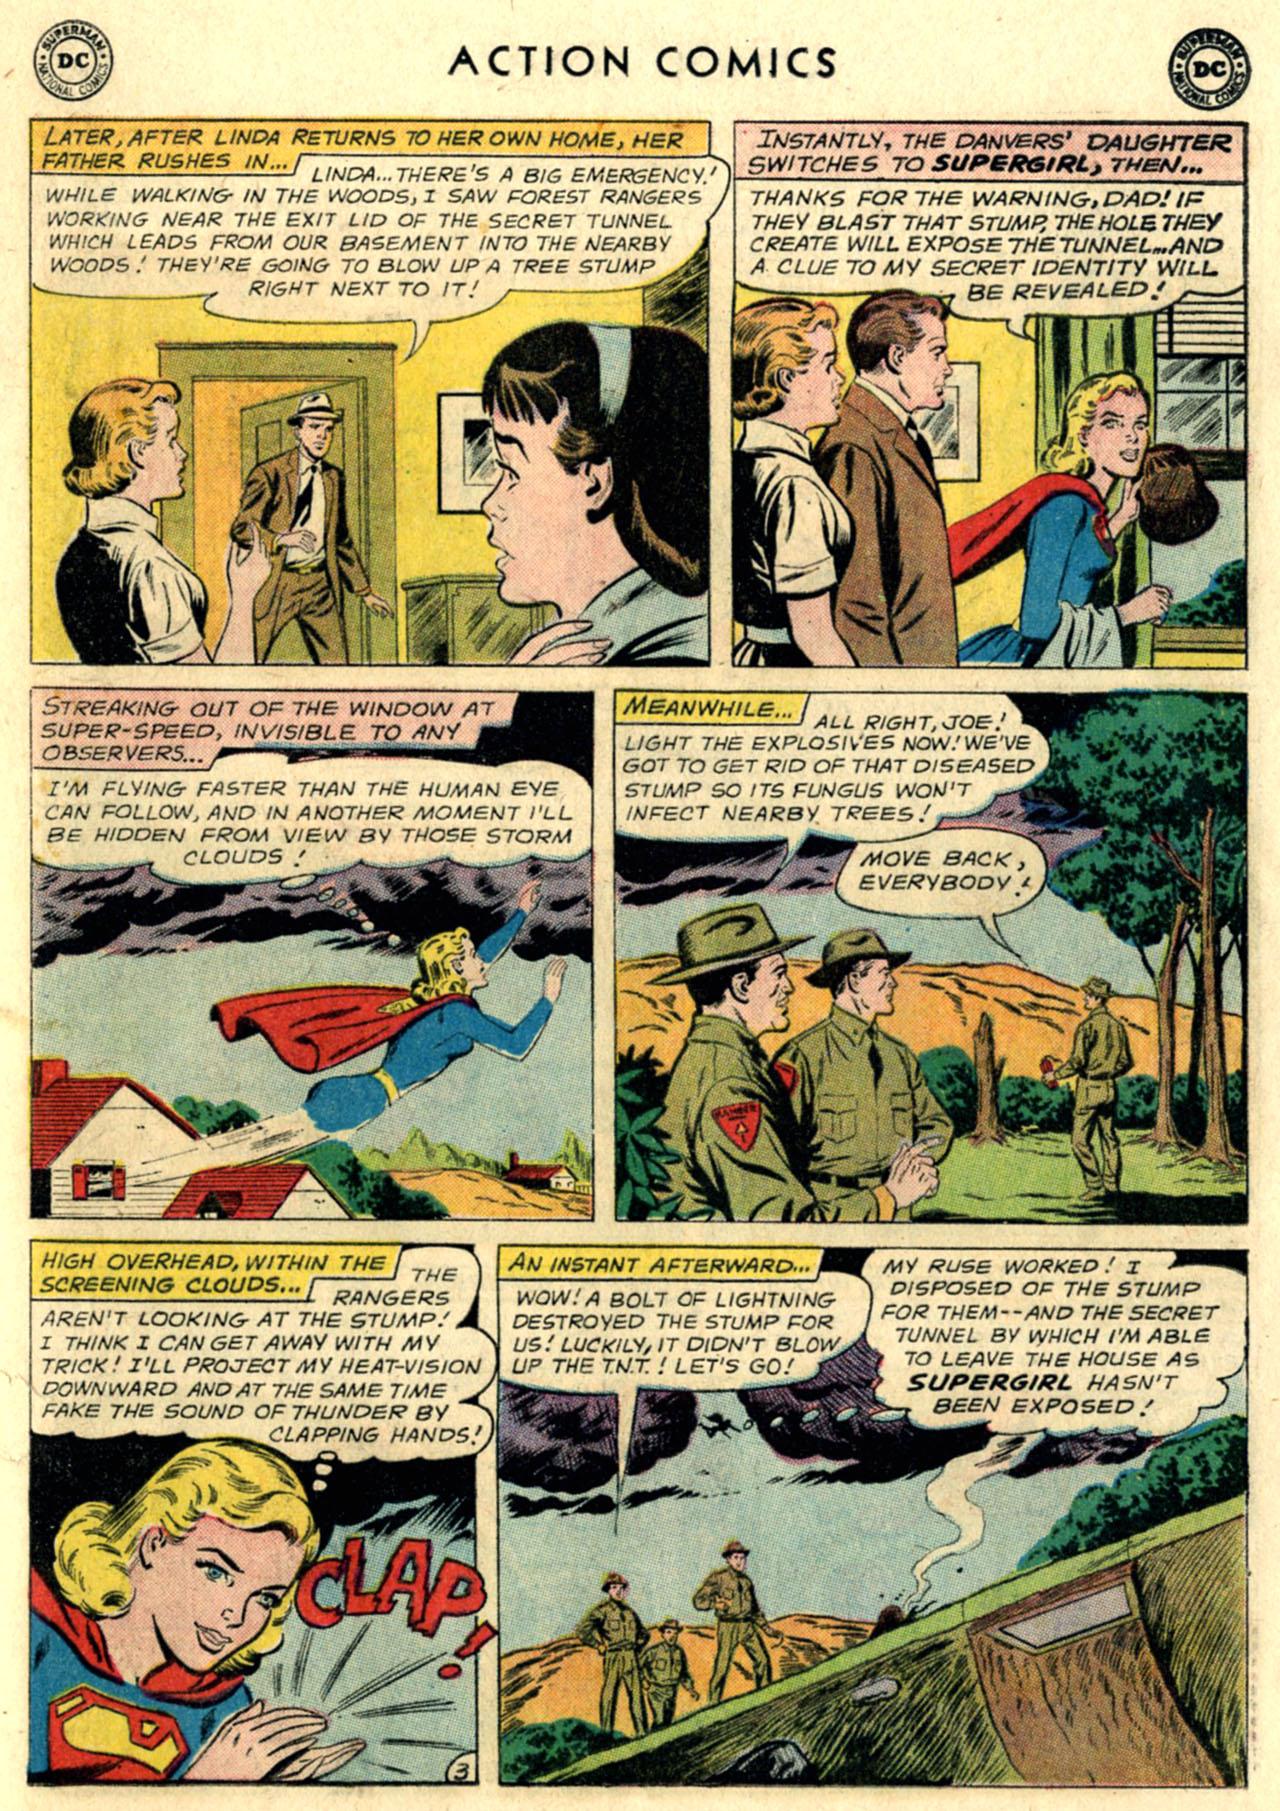 Action Comics (1938) 287 Page 20